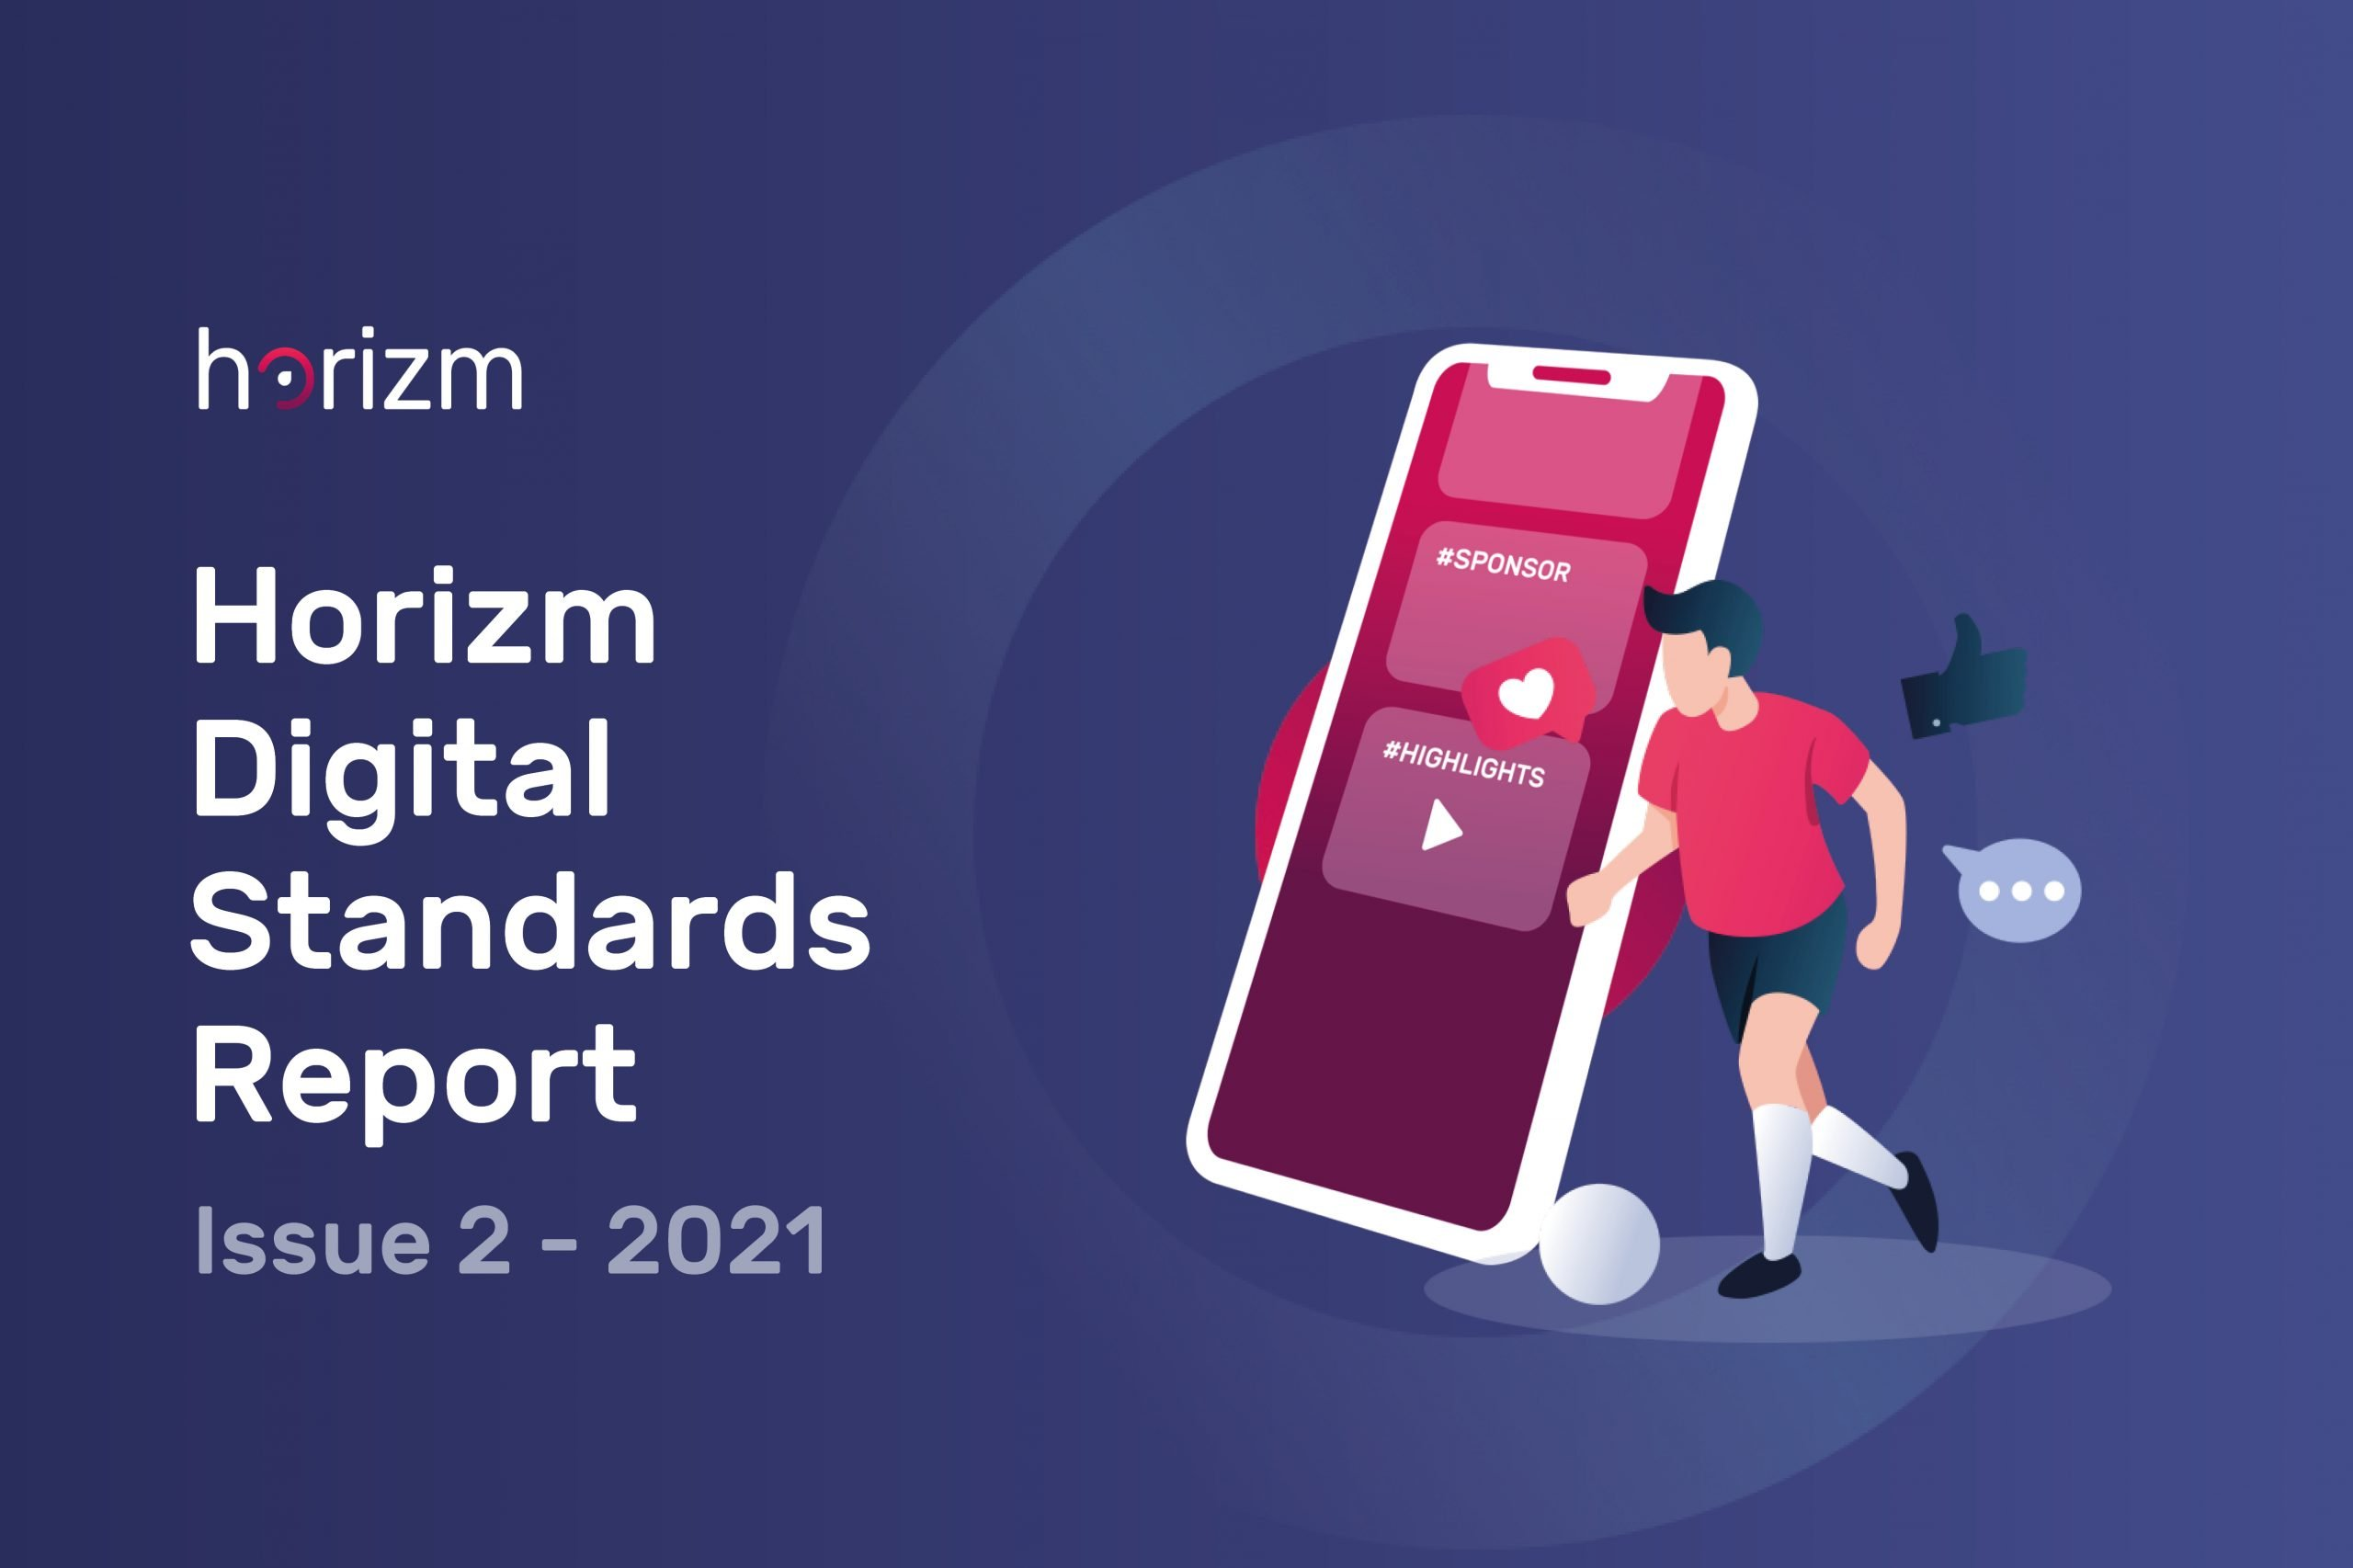 Horizm Digital Standards Report, Issue 2 – 2021